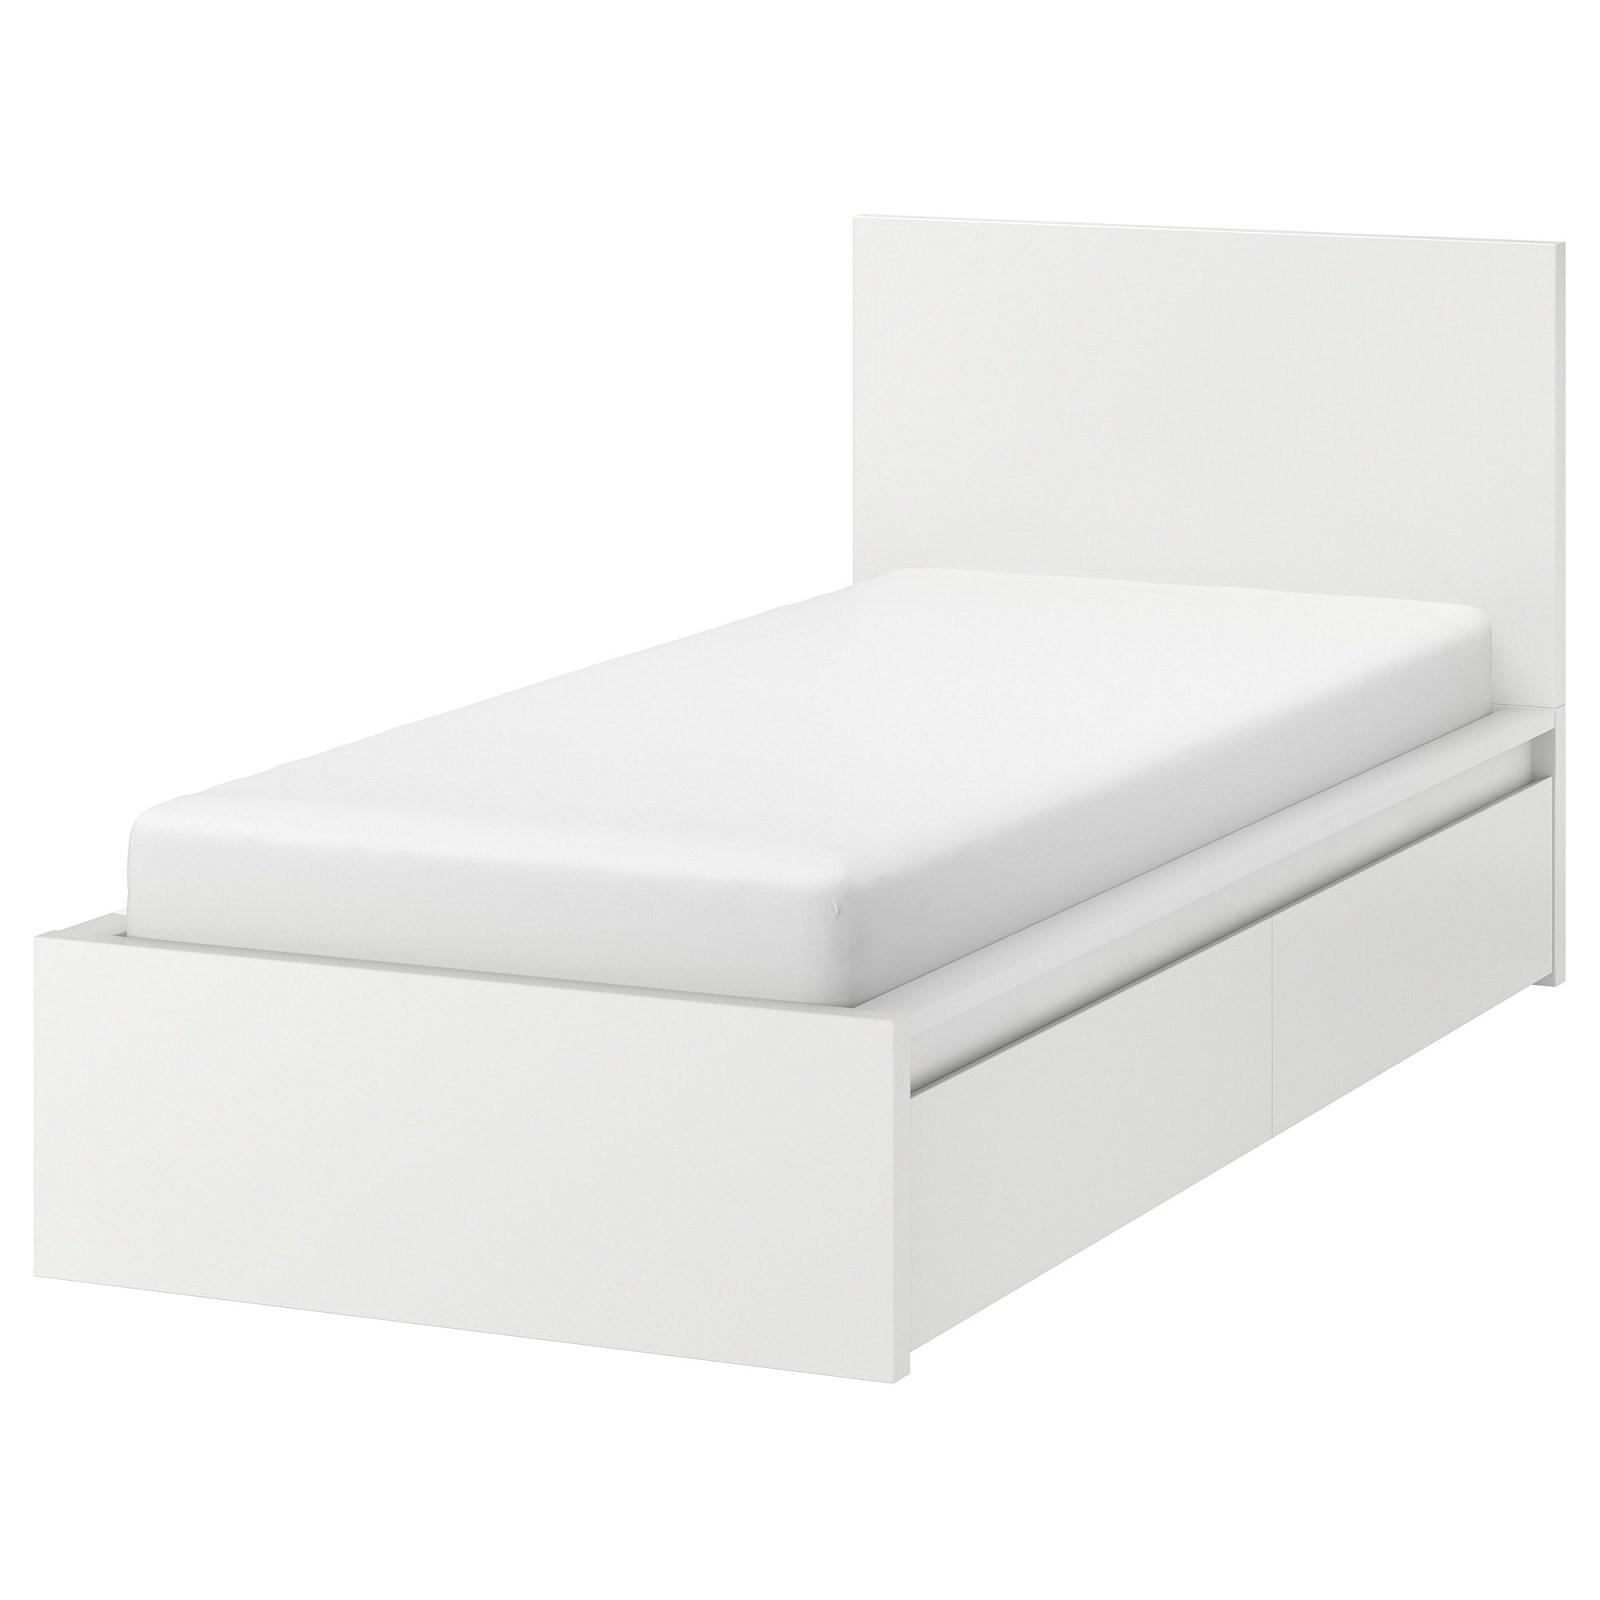 Malm Bedframe Hoog Met 2 Bedlades   Wit  Ikea von Ikea Malm Bett 90X200 Photo